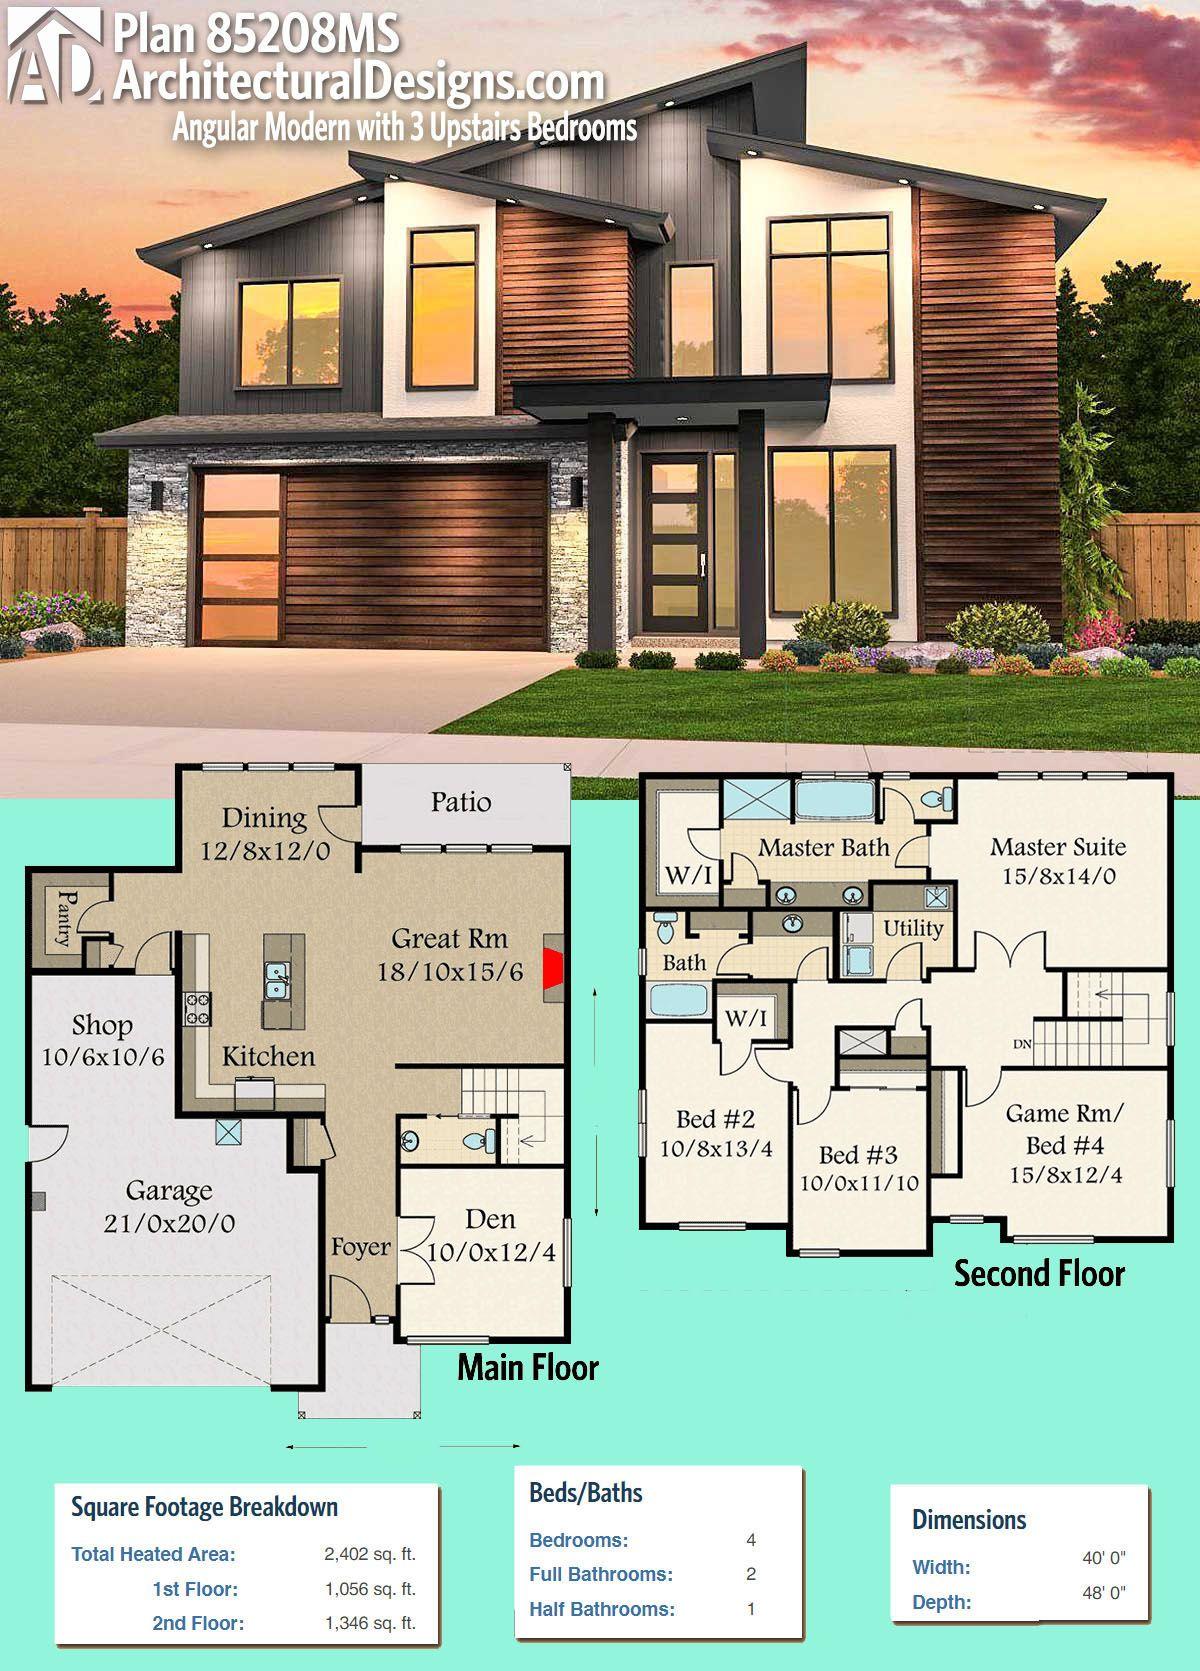 Plan 85208ms Angular Modern House Plan With 3 Upstairs